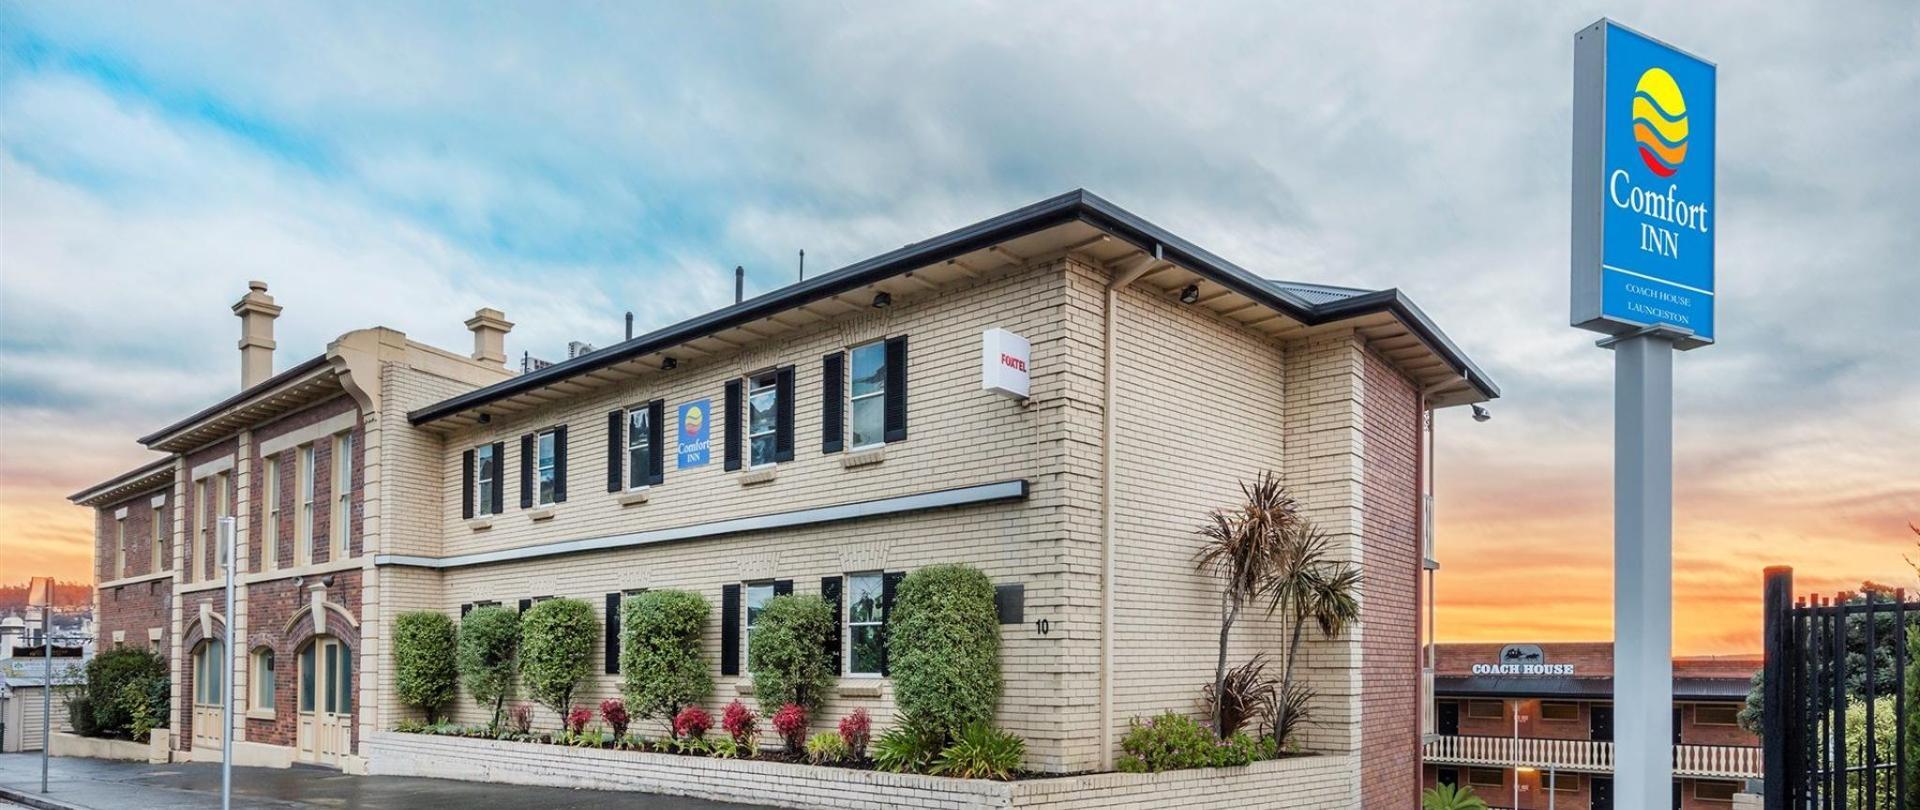 Comfort Inn Coach House Launceston.jpg